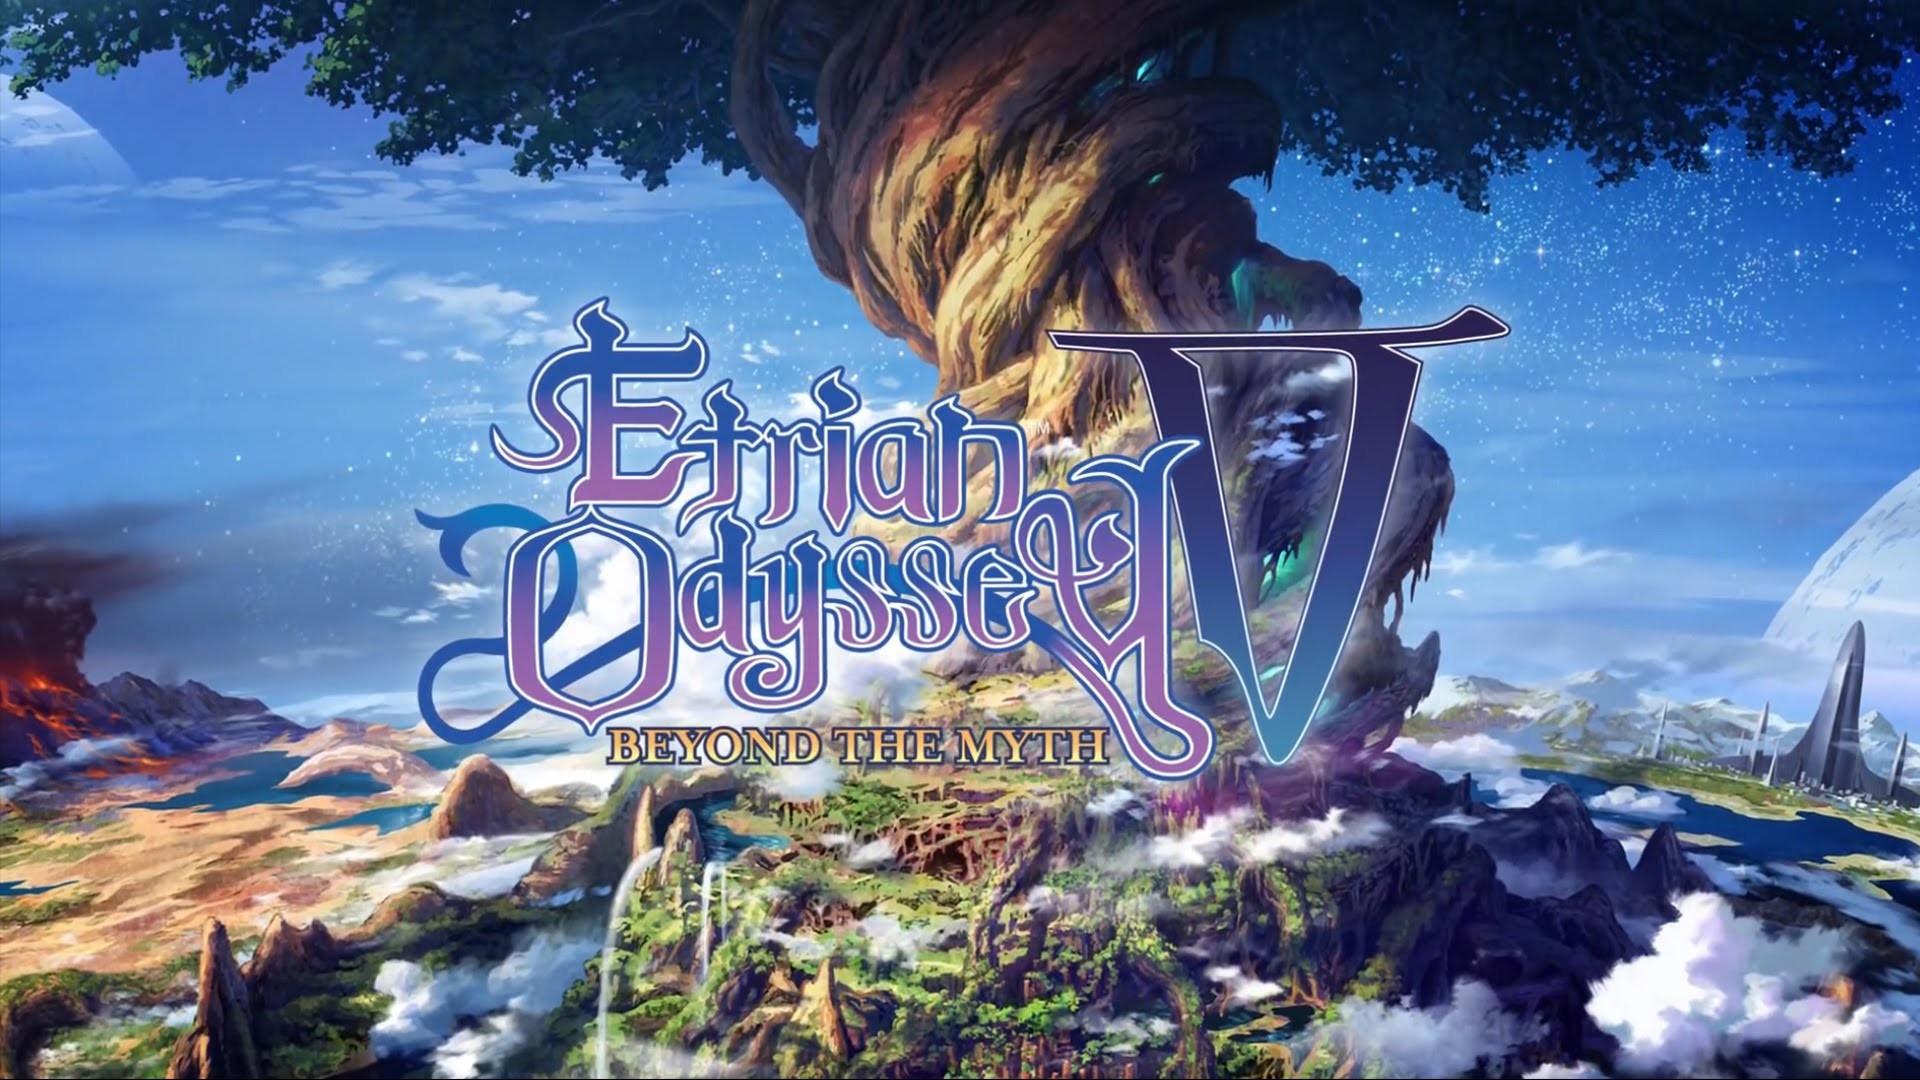 Etrian Odyssey V: Beyond the Myth – Brave The Yggdrasil Tree Trailer